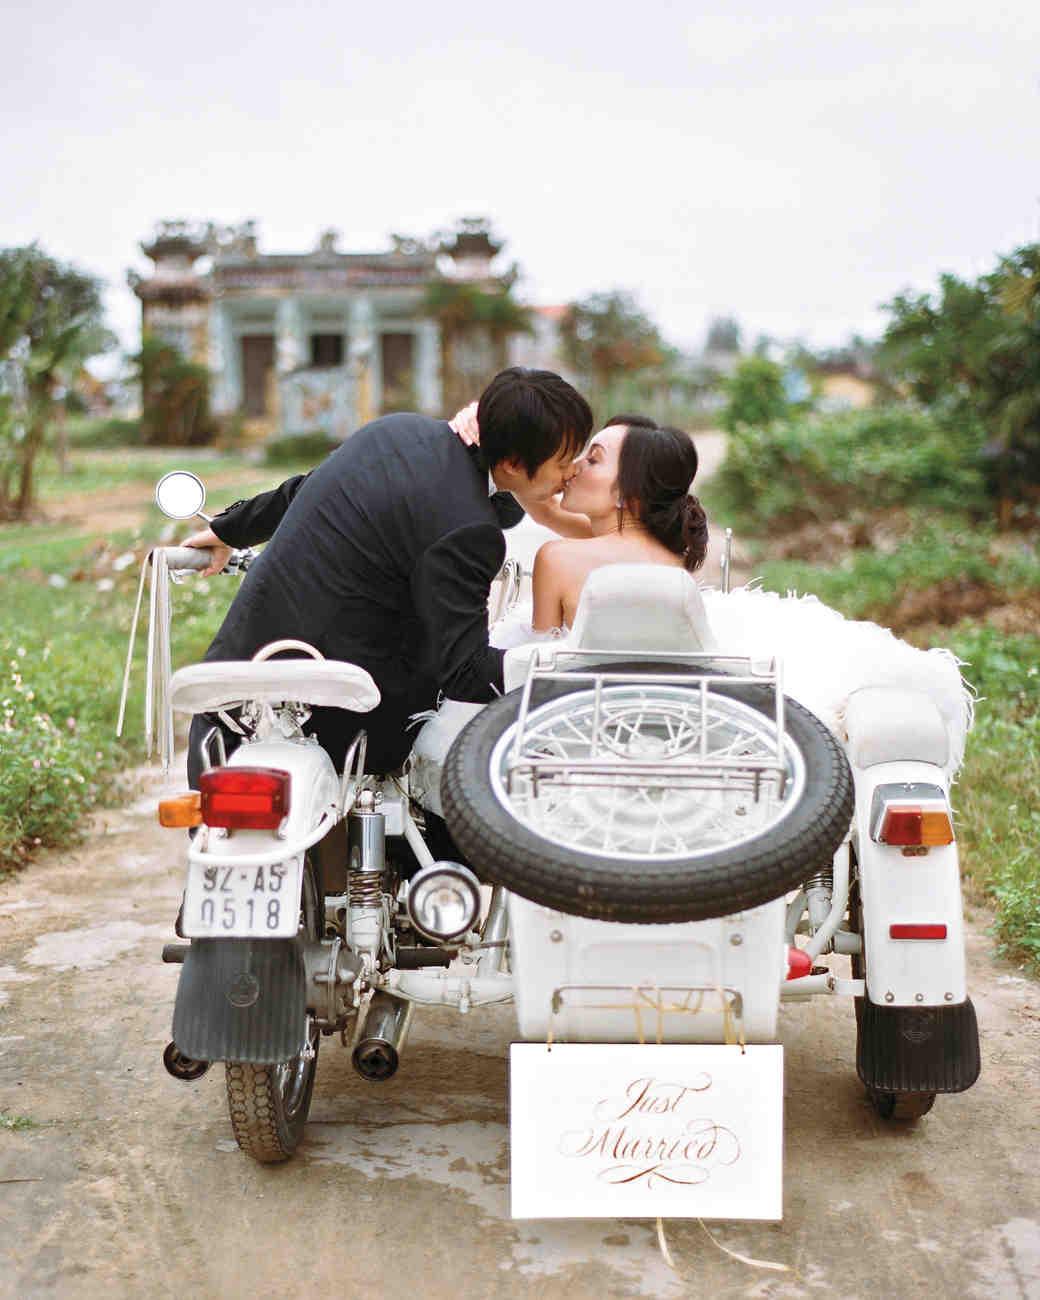 quinn-andy-motorbike-0190-mwds108811.jpg